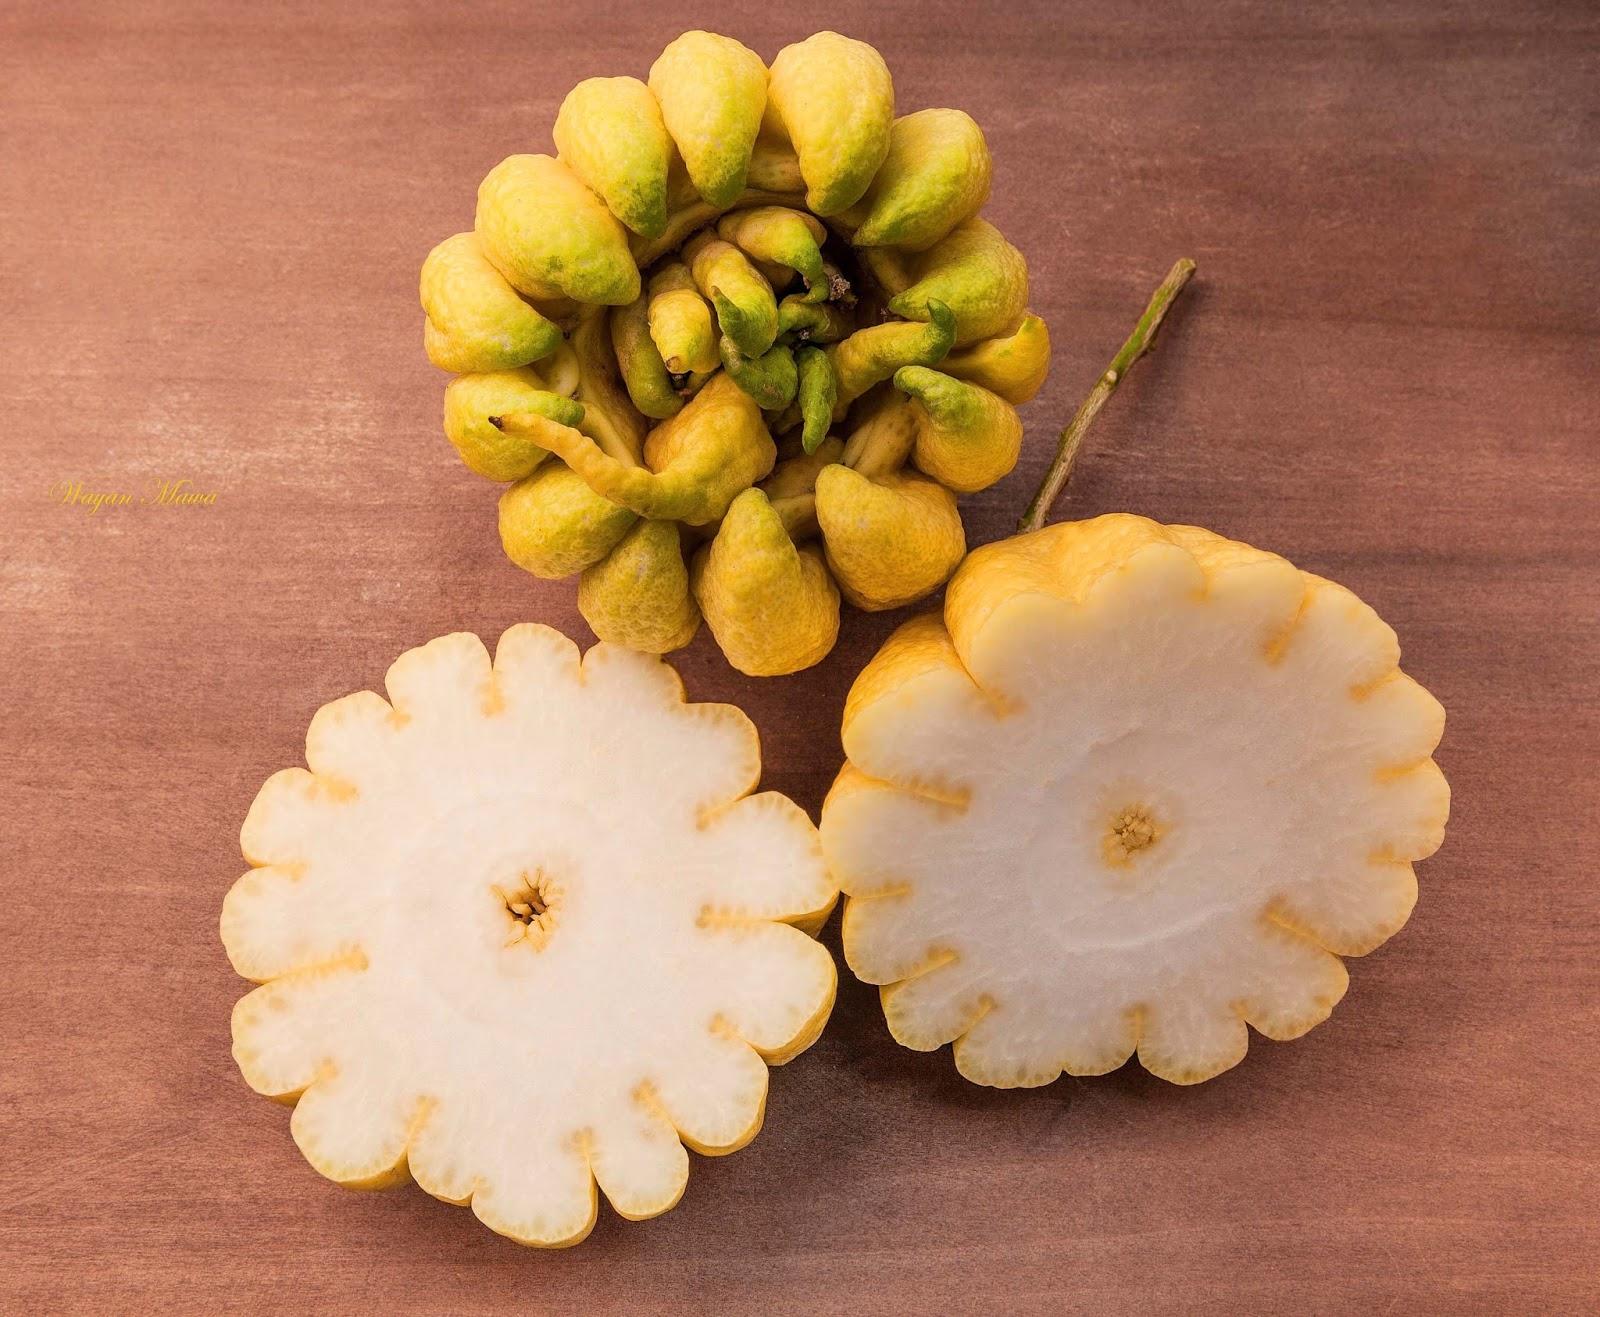 mawanusa blog the buddha 39 s hand citrus fruit. Black Bedroom Furniture Sets. Home Design Ideas